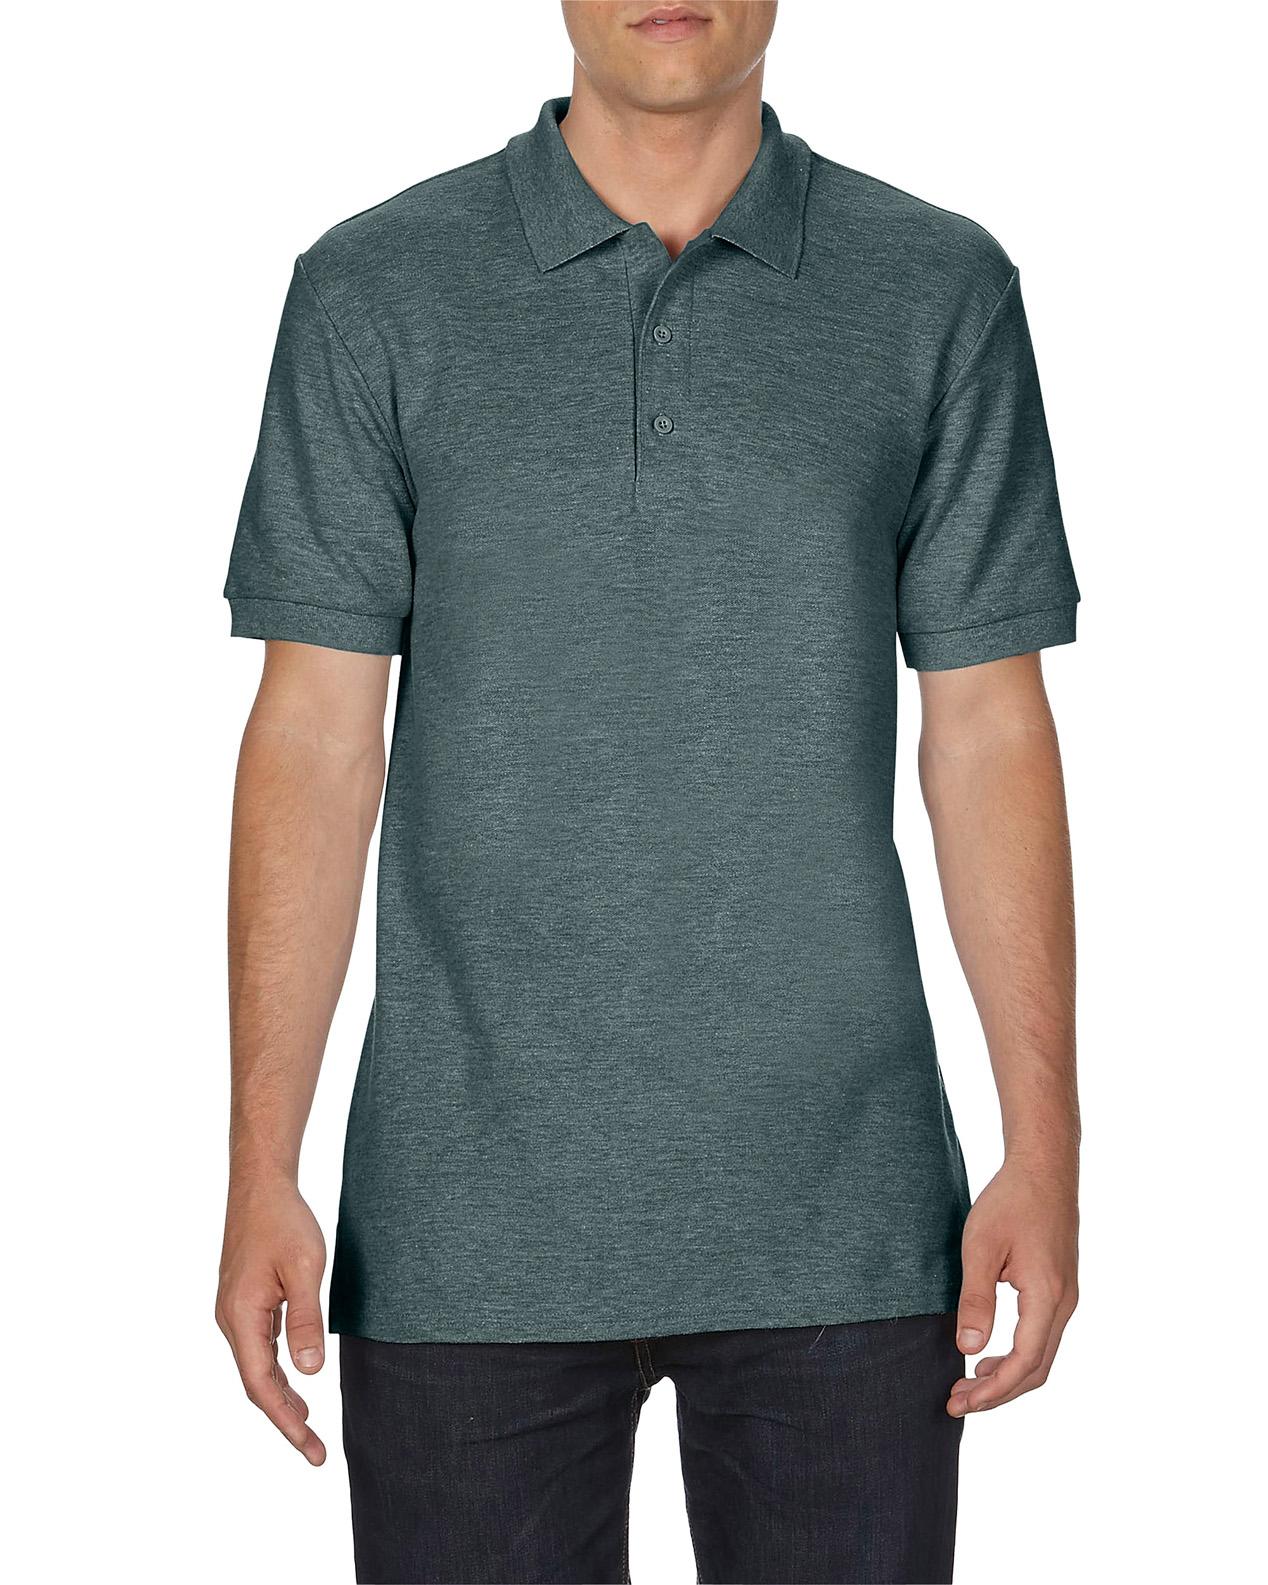 100 cotton Gildan polo shirt dark heather